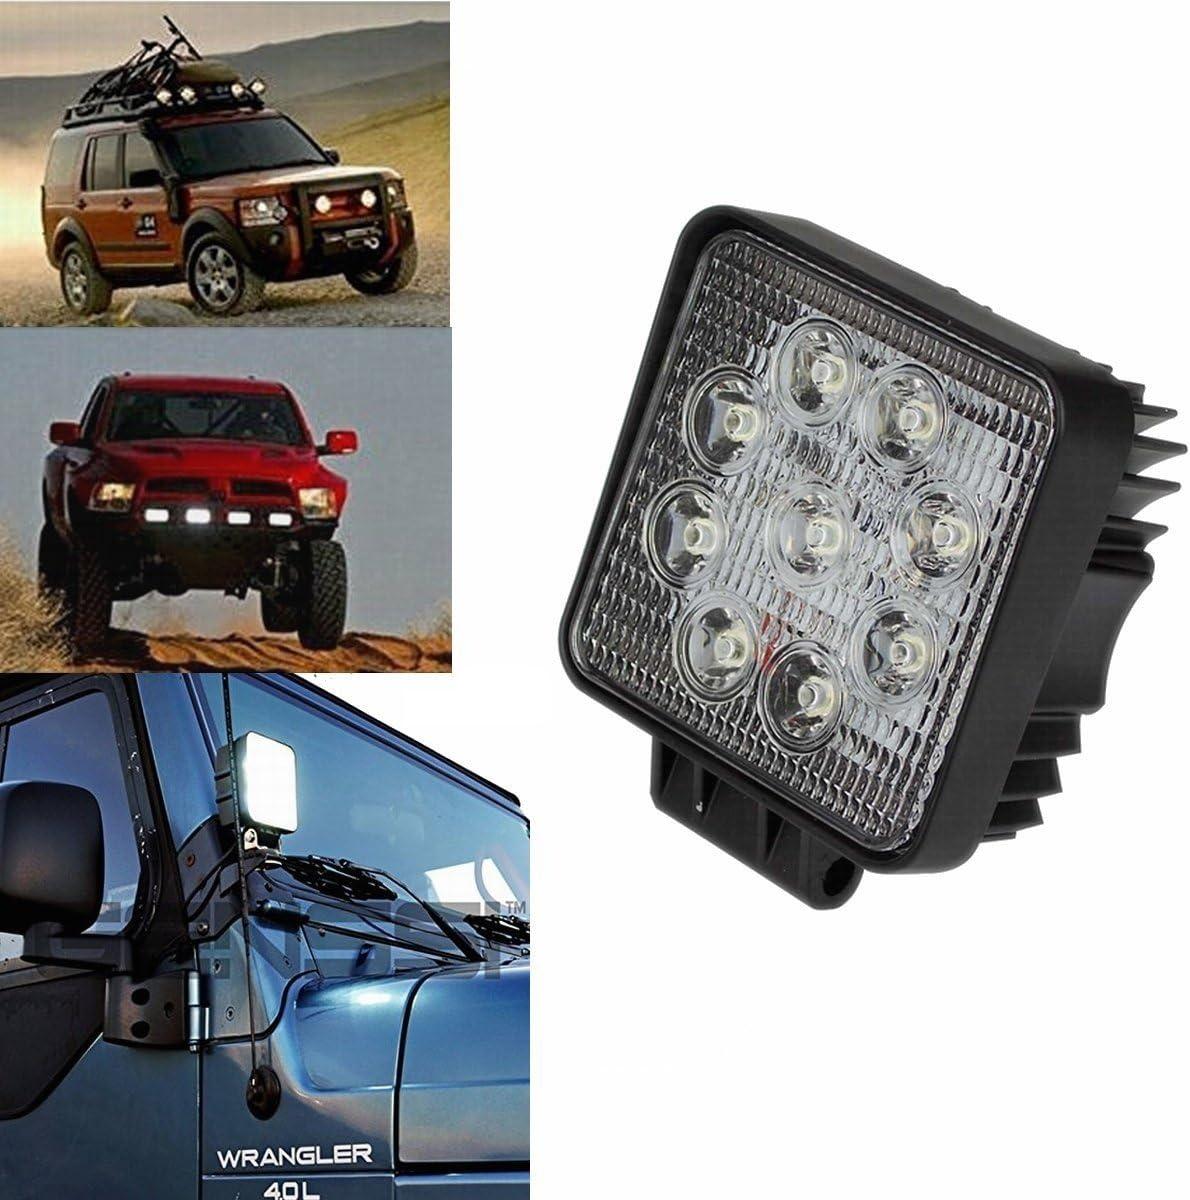 Adicionales L/ámparas de Campo a Trav/és de la Linterna 12V 24V luz de Marcha Atr/ás ATV Offroad Foco Reflector Foco de Trabajo LARS360 4x 27W LED Focos de Trabajo UTV Faros de Trabajo de SUV